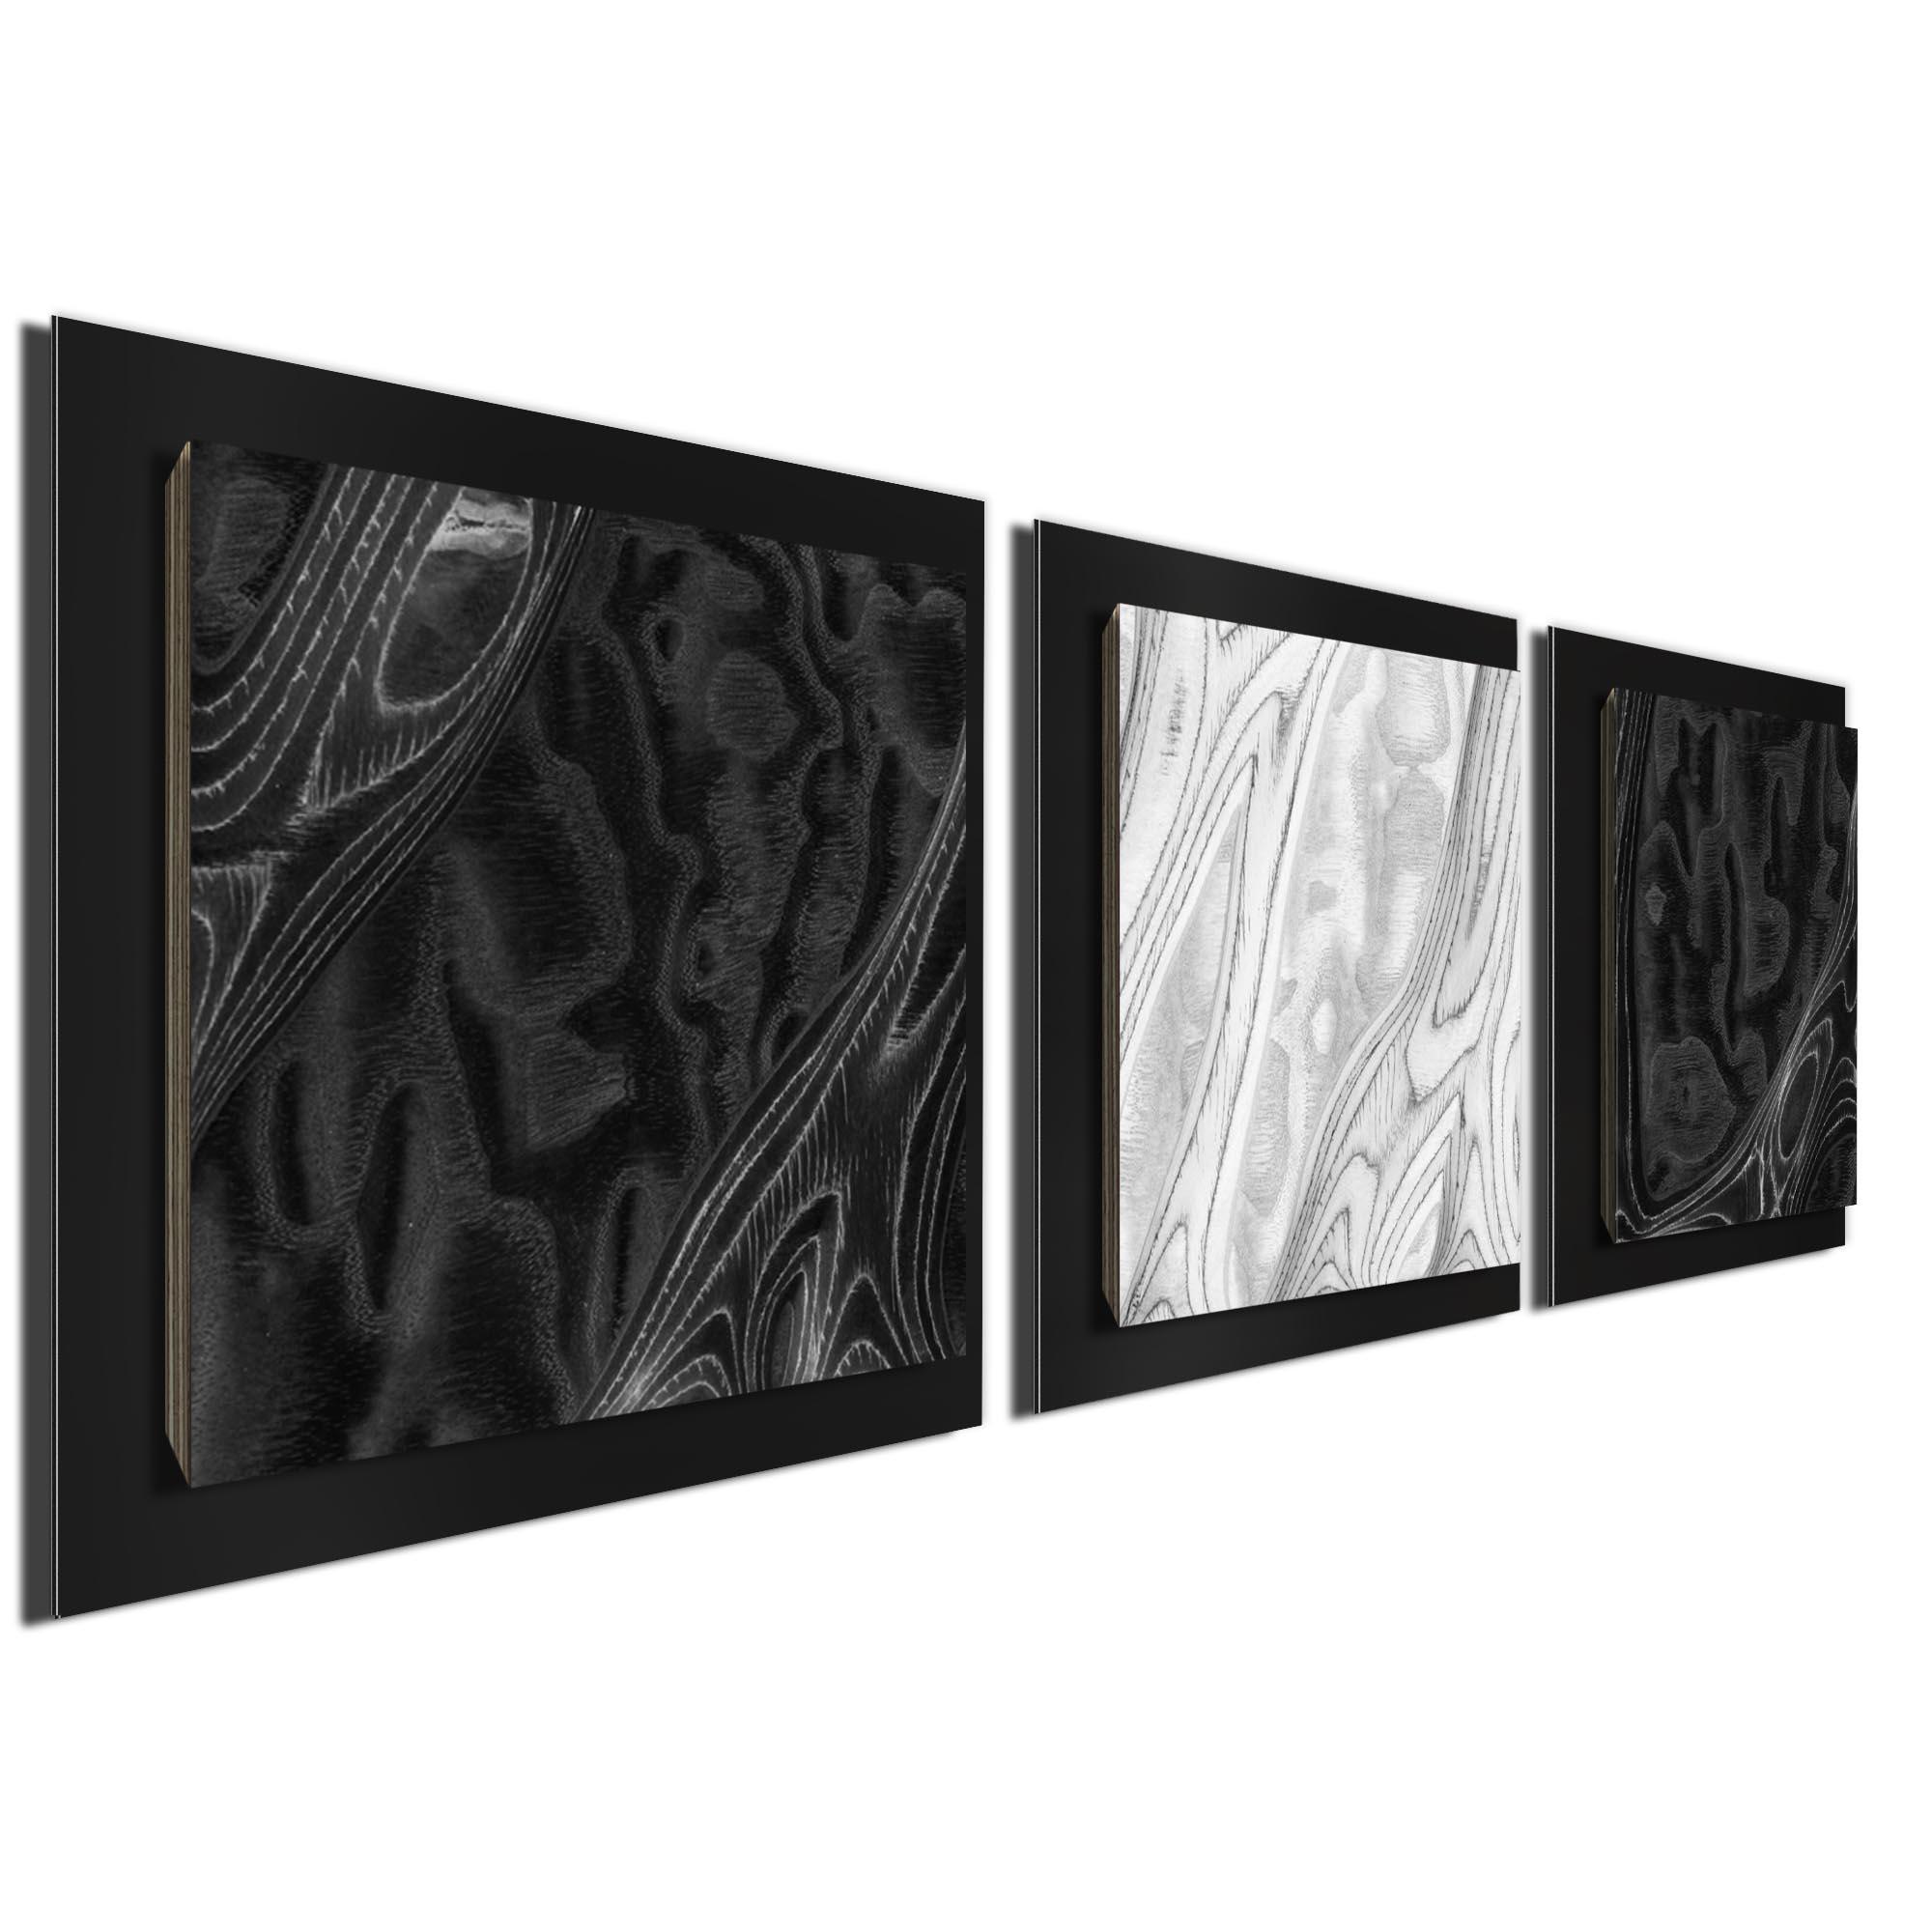 BWB Burl Essence Black by Jackson Wright Rustic Modern Style Wood Wall Art - Image 2